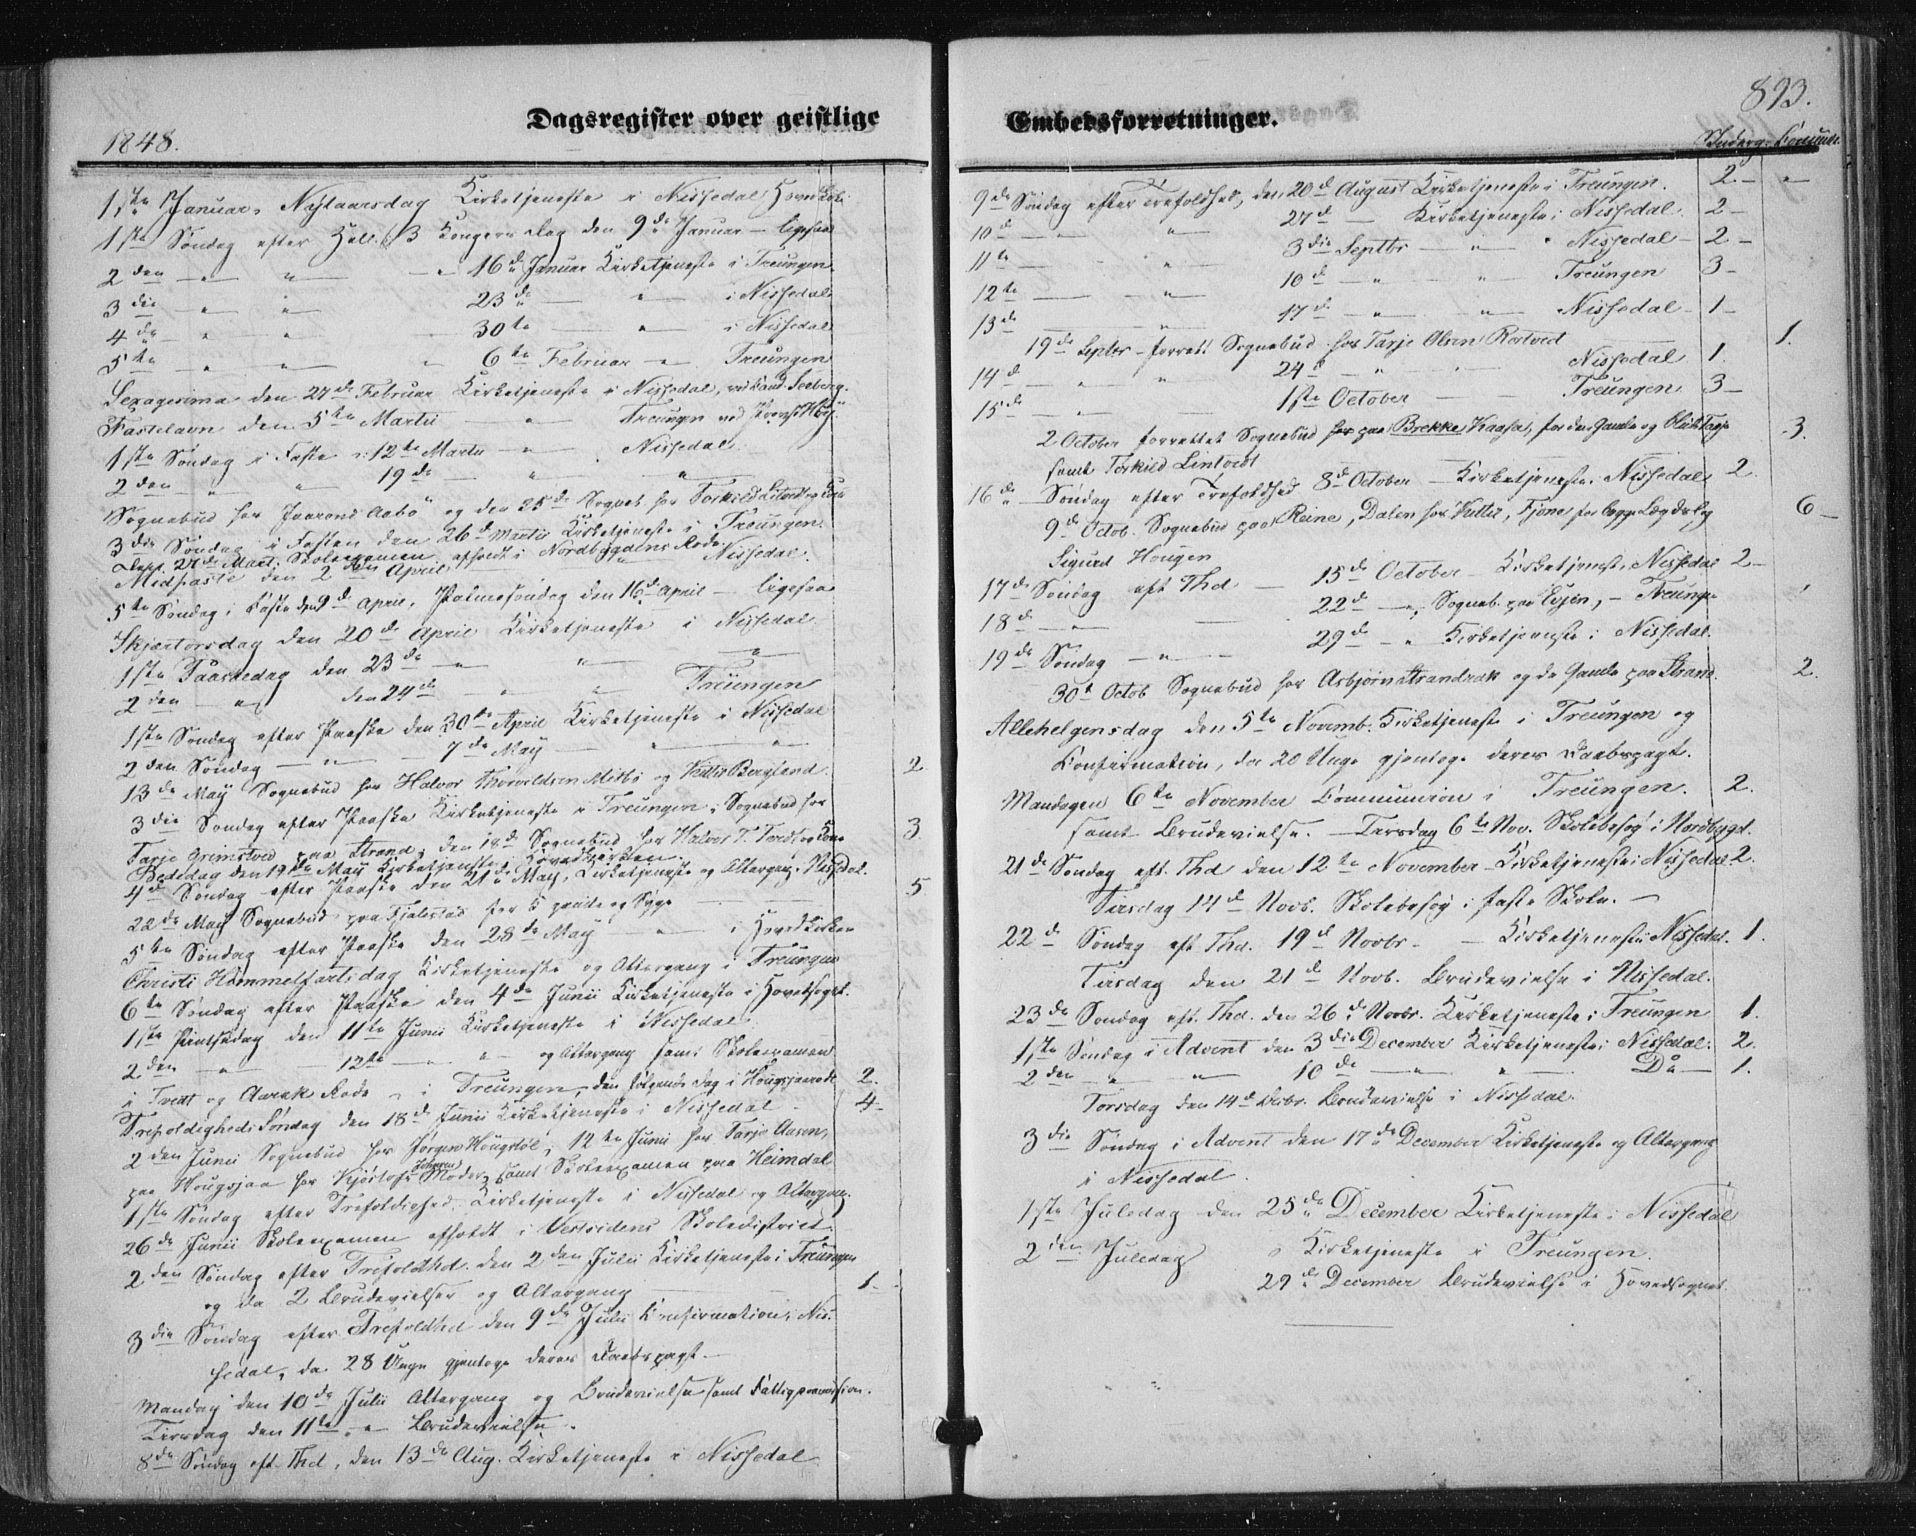 SAKO, Nissedal kirkebøker, F/Fa/L0003: Ministerialbok nr. I 3, 1846-1870, s. 892-893